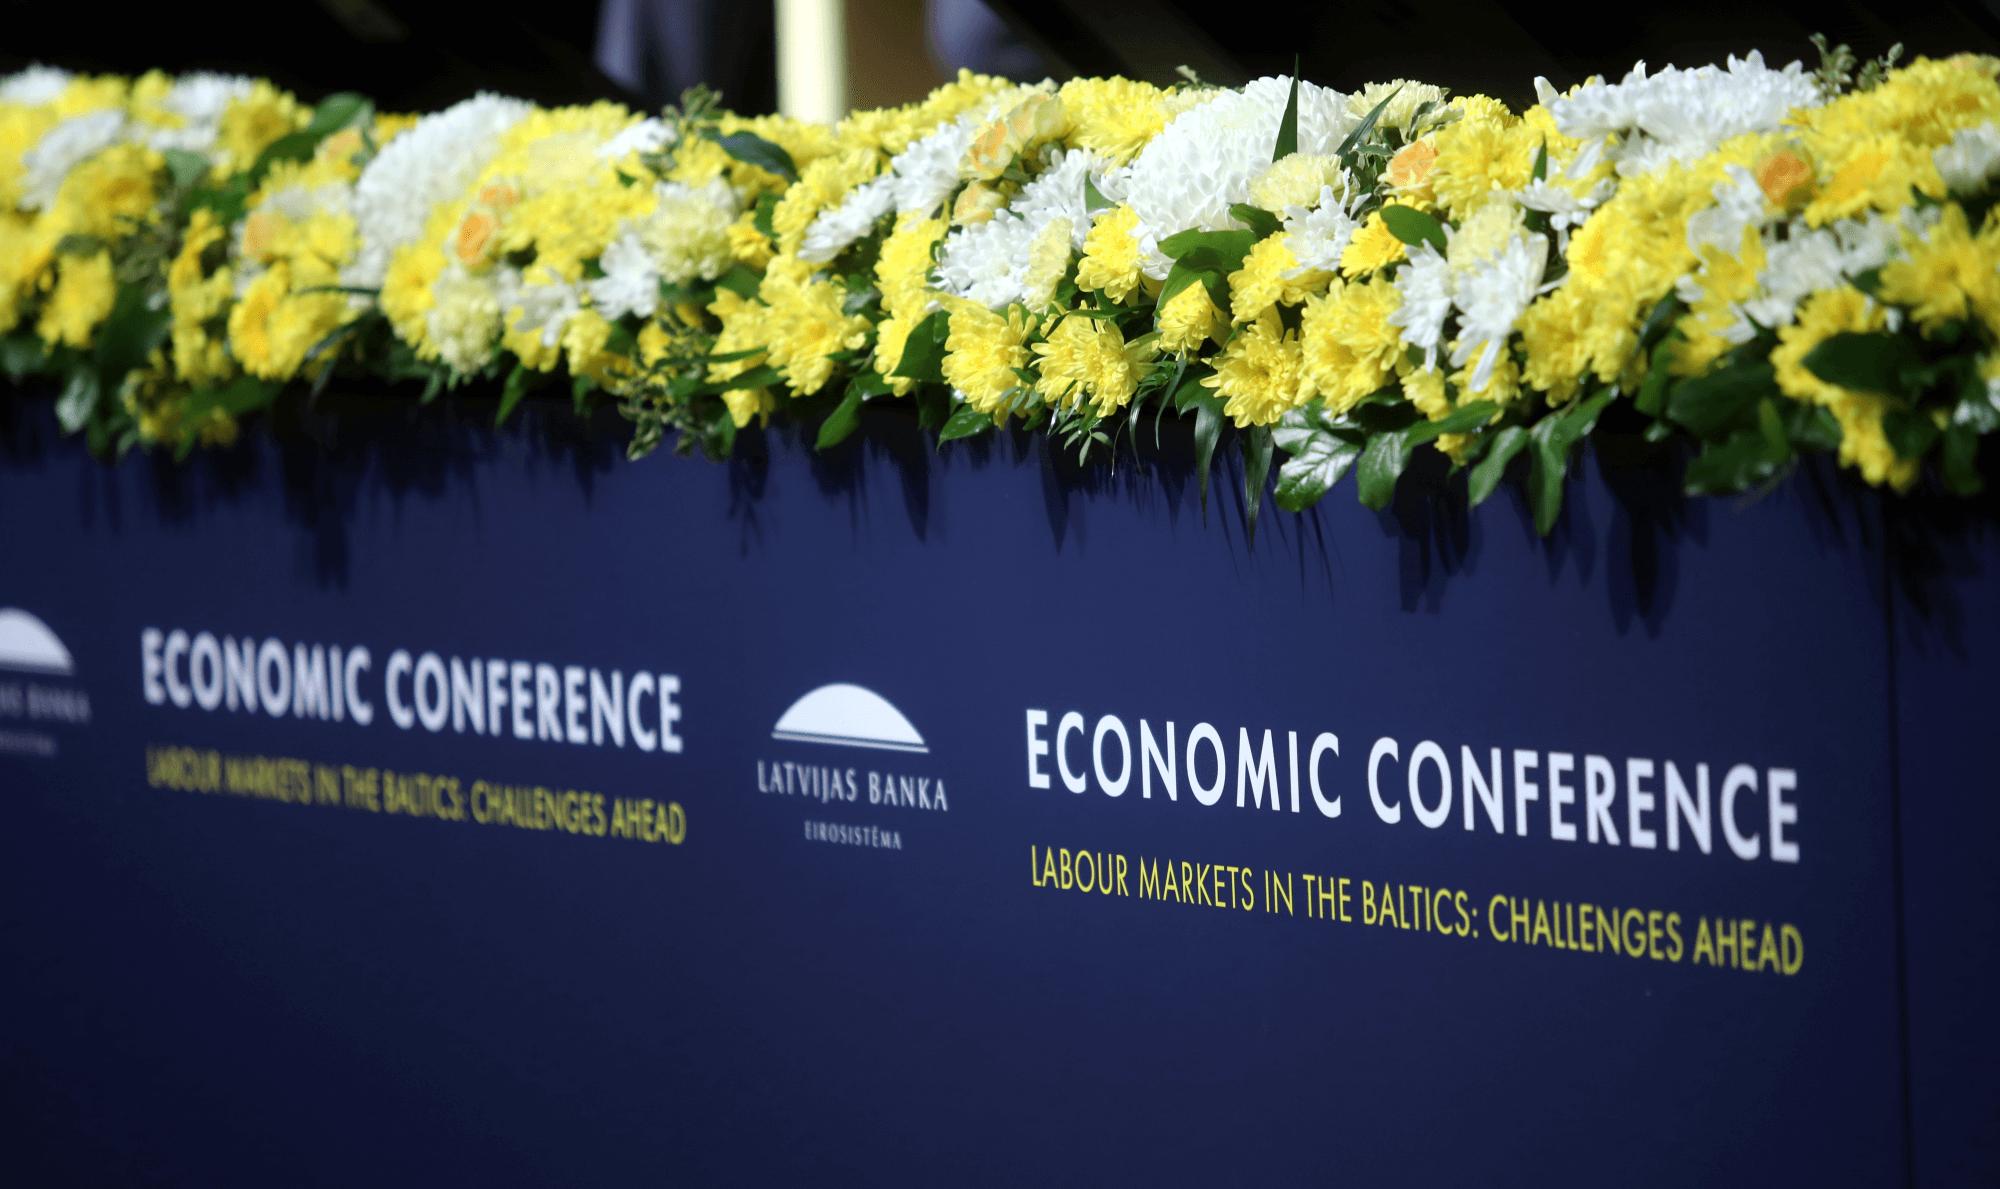 Latvijas Bankas tautsaimniecības konference 2019